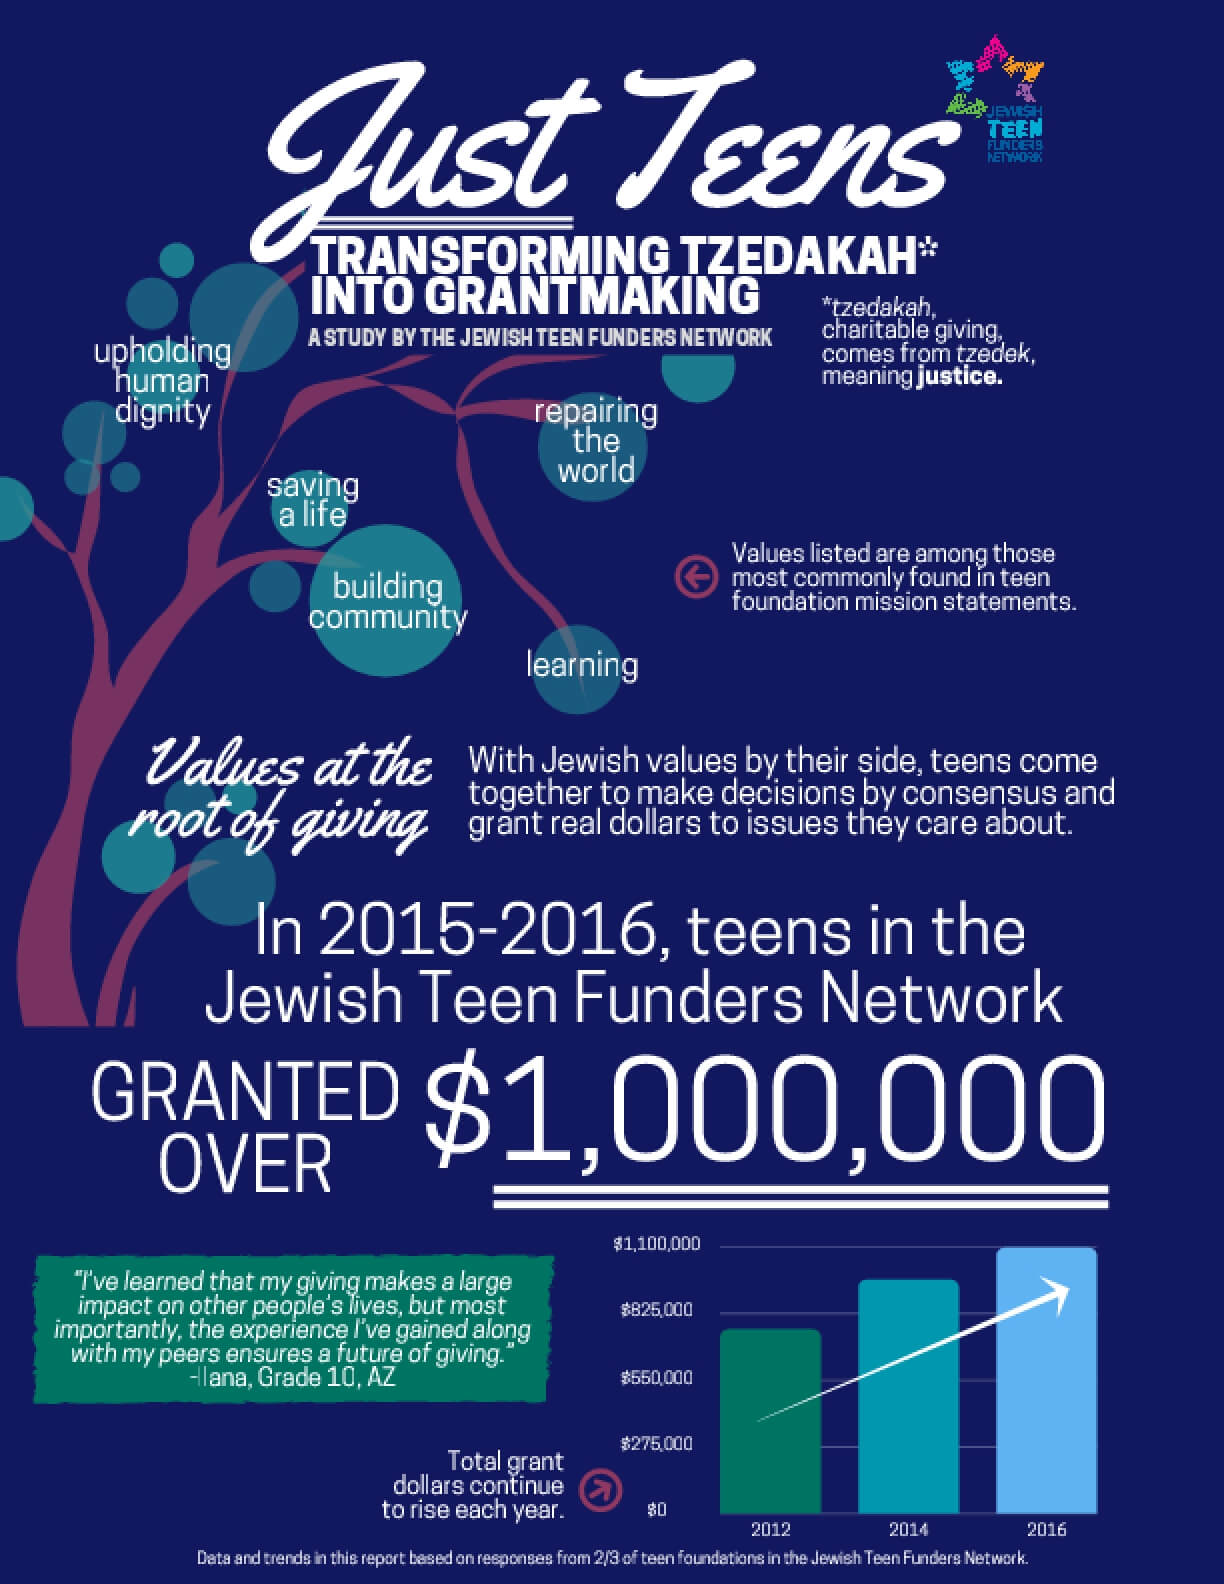 Just Teens: Transforming Tzedakah Into Grantmaking